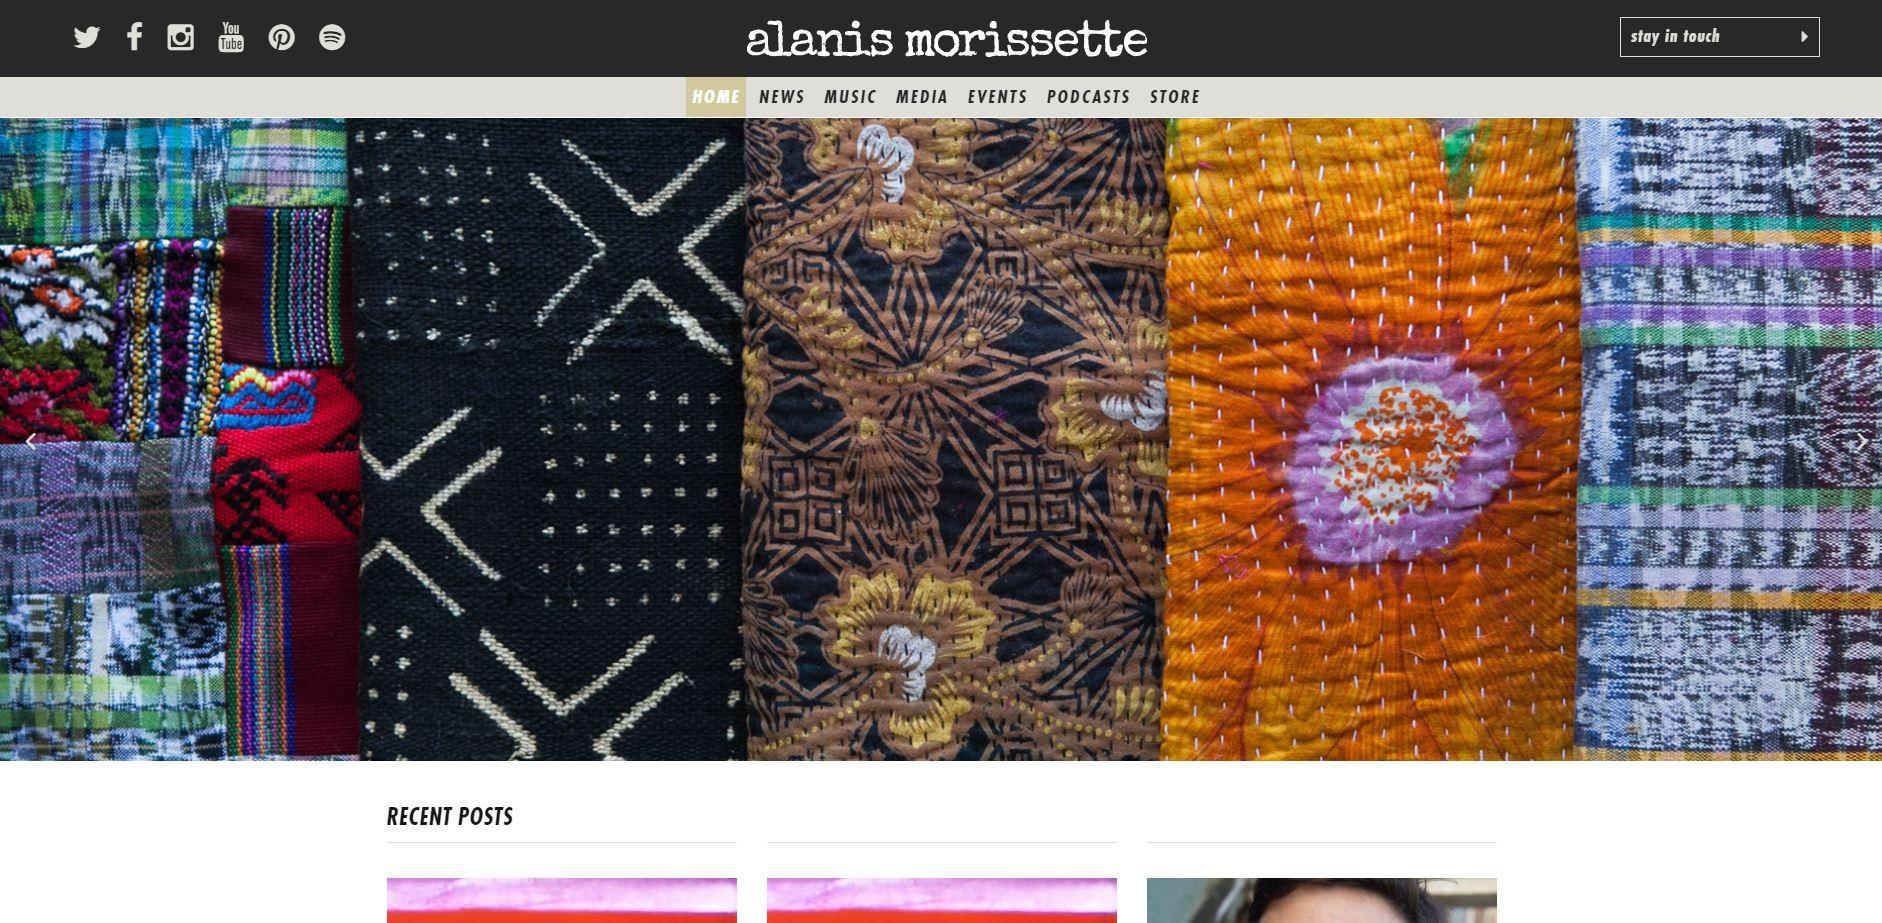 pagina web alanis morissette wordpress